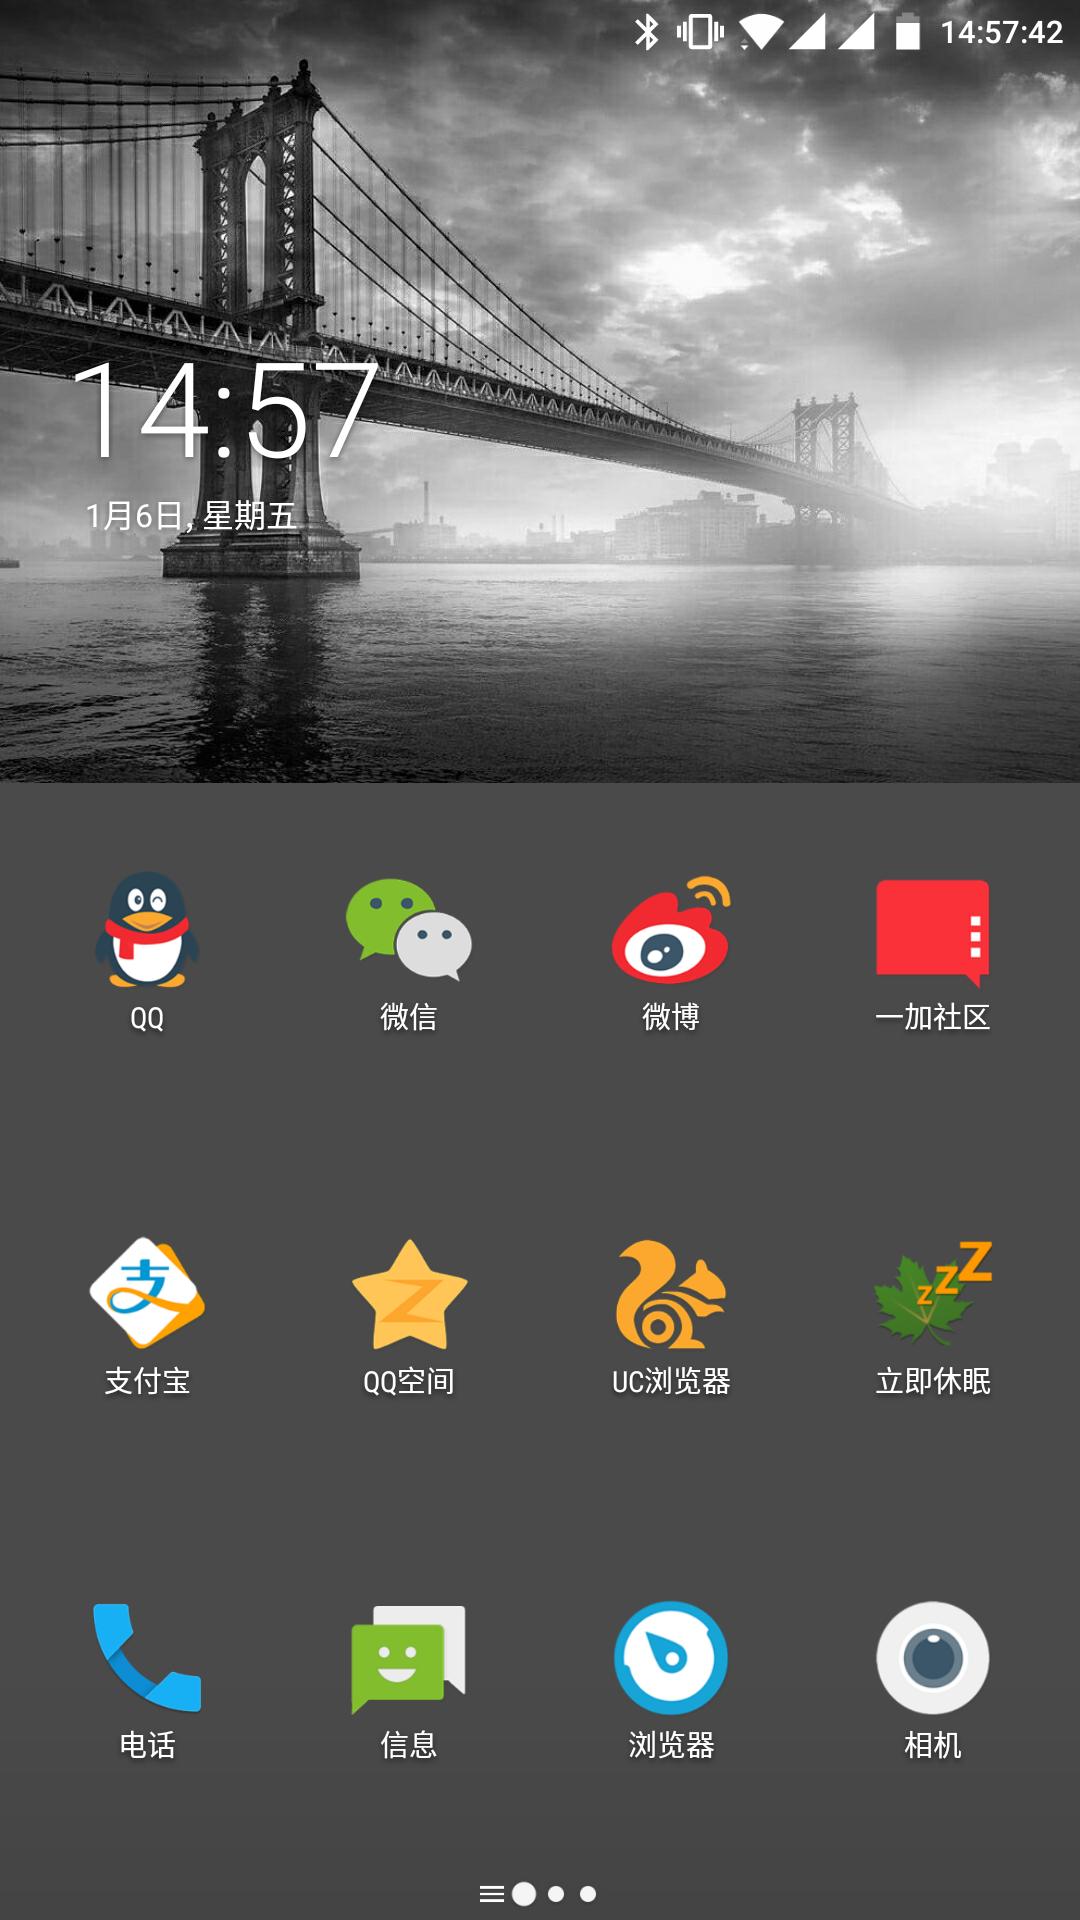 Screenshot_20170106-145743.png